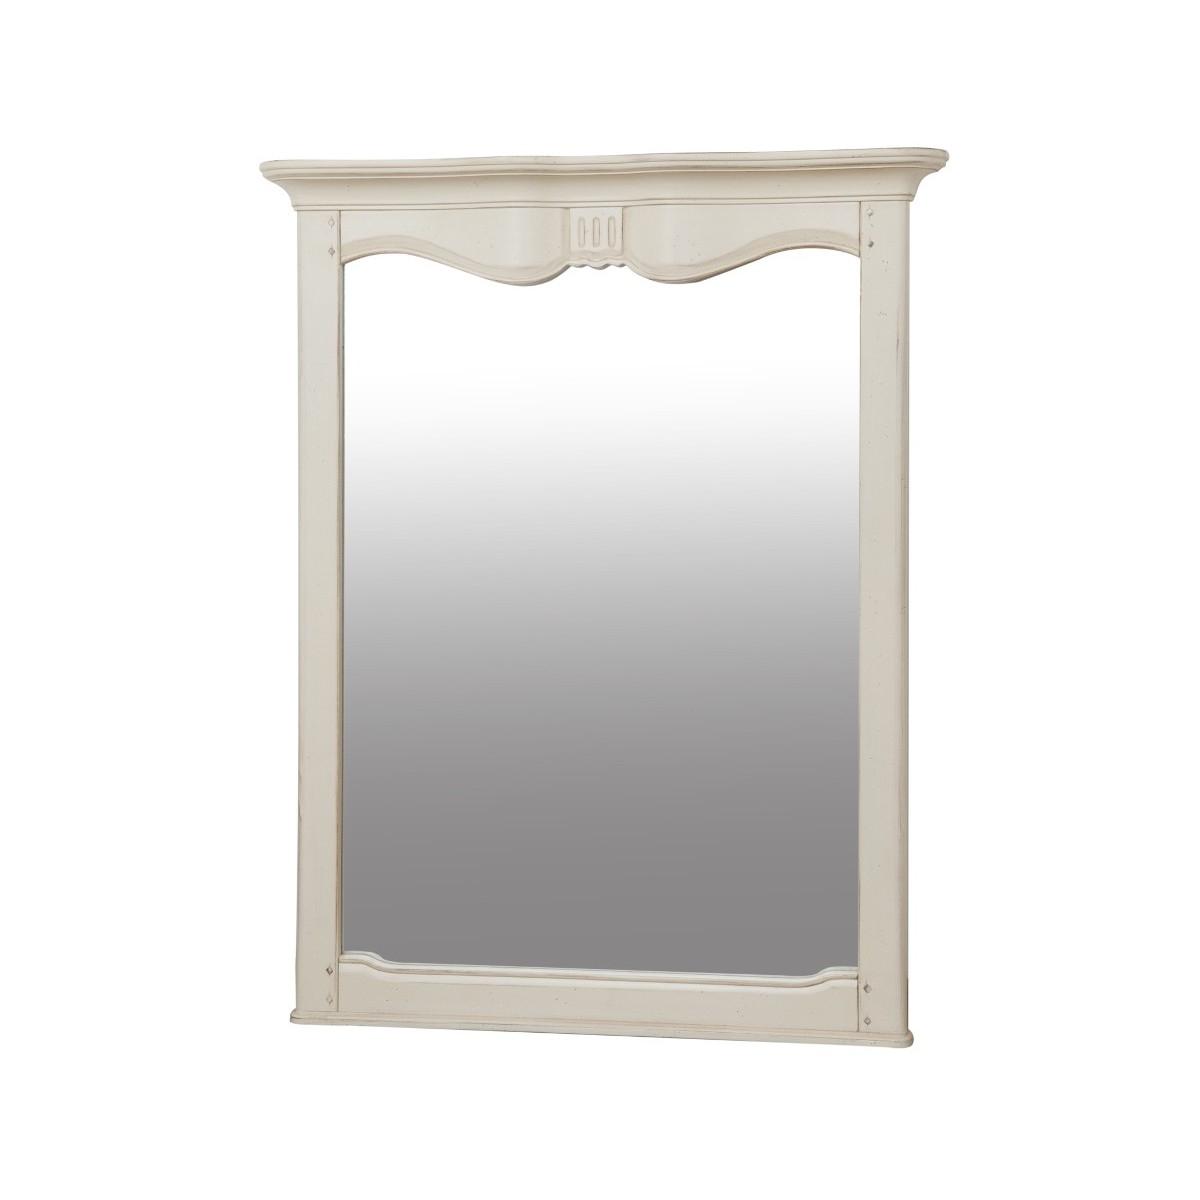 Oglinda Decorativa Lemn Mesteacan - 8685